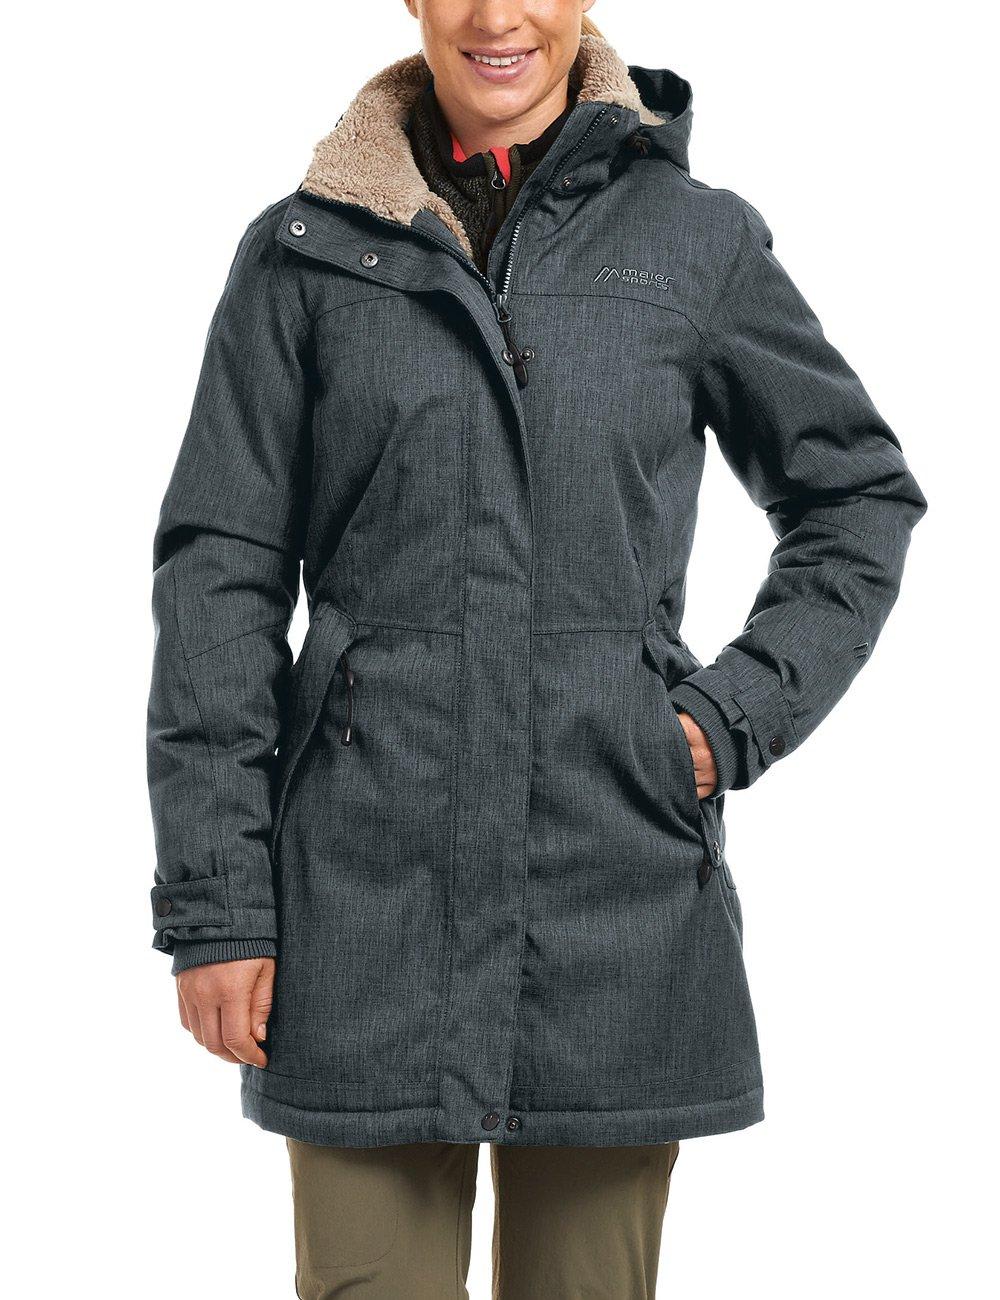 maier sports Damen Outdoor Mantel BI Elastisch Edessa